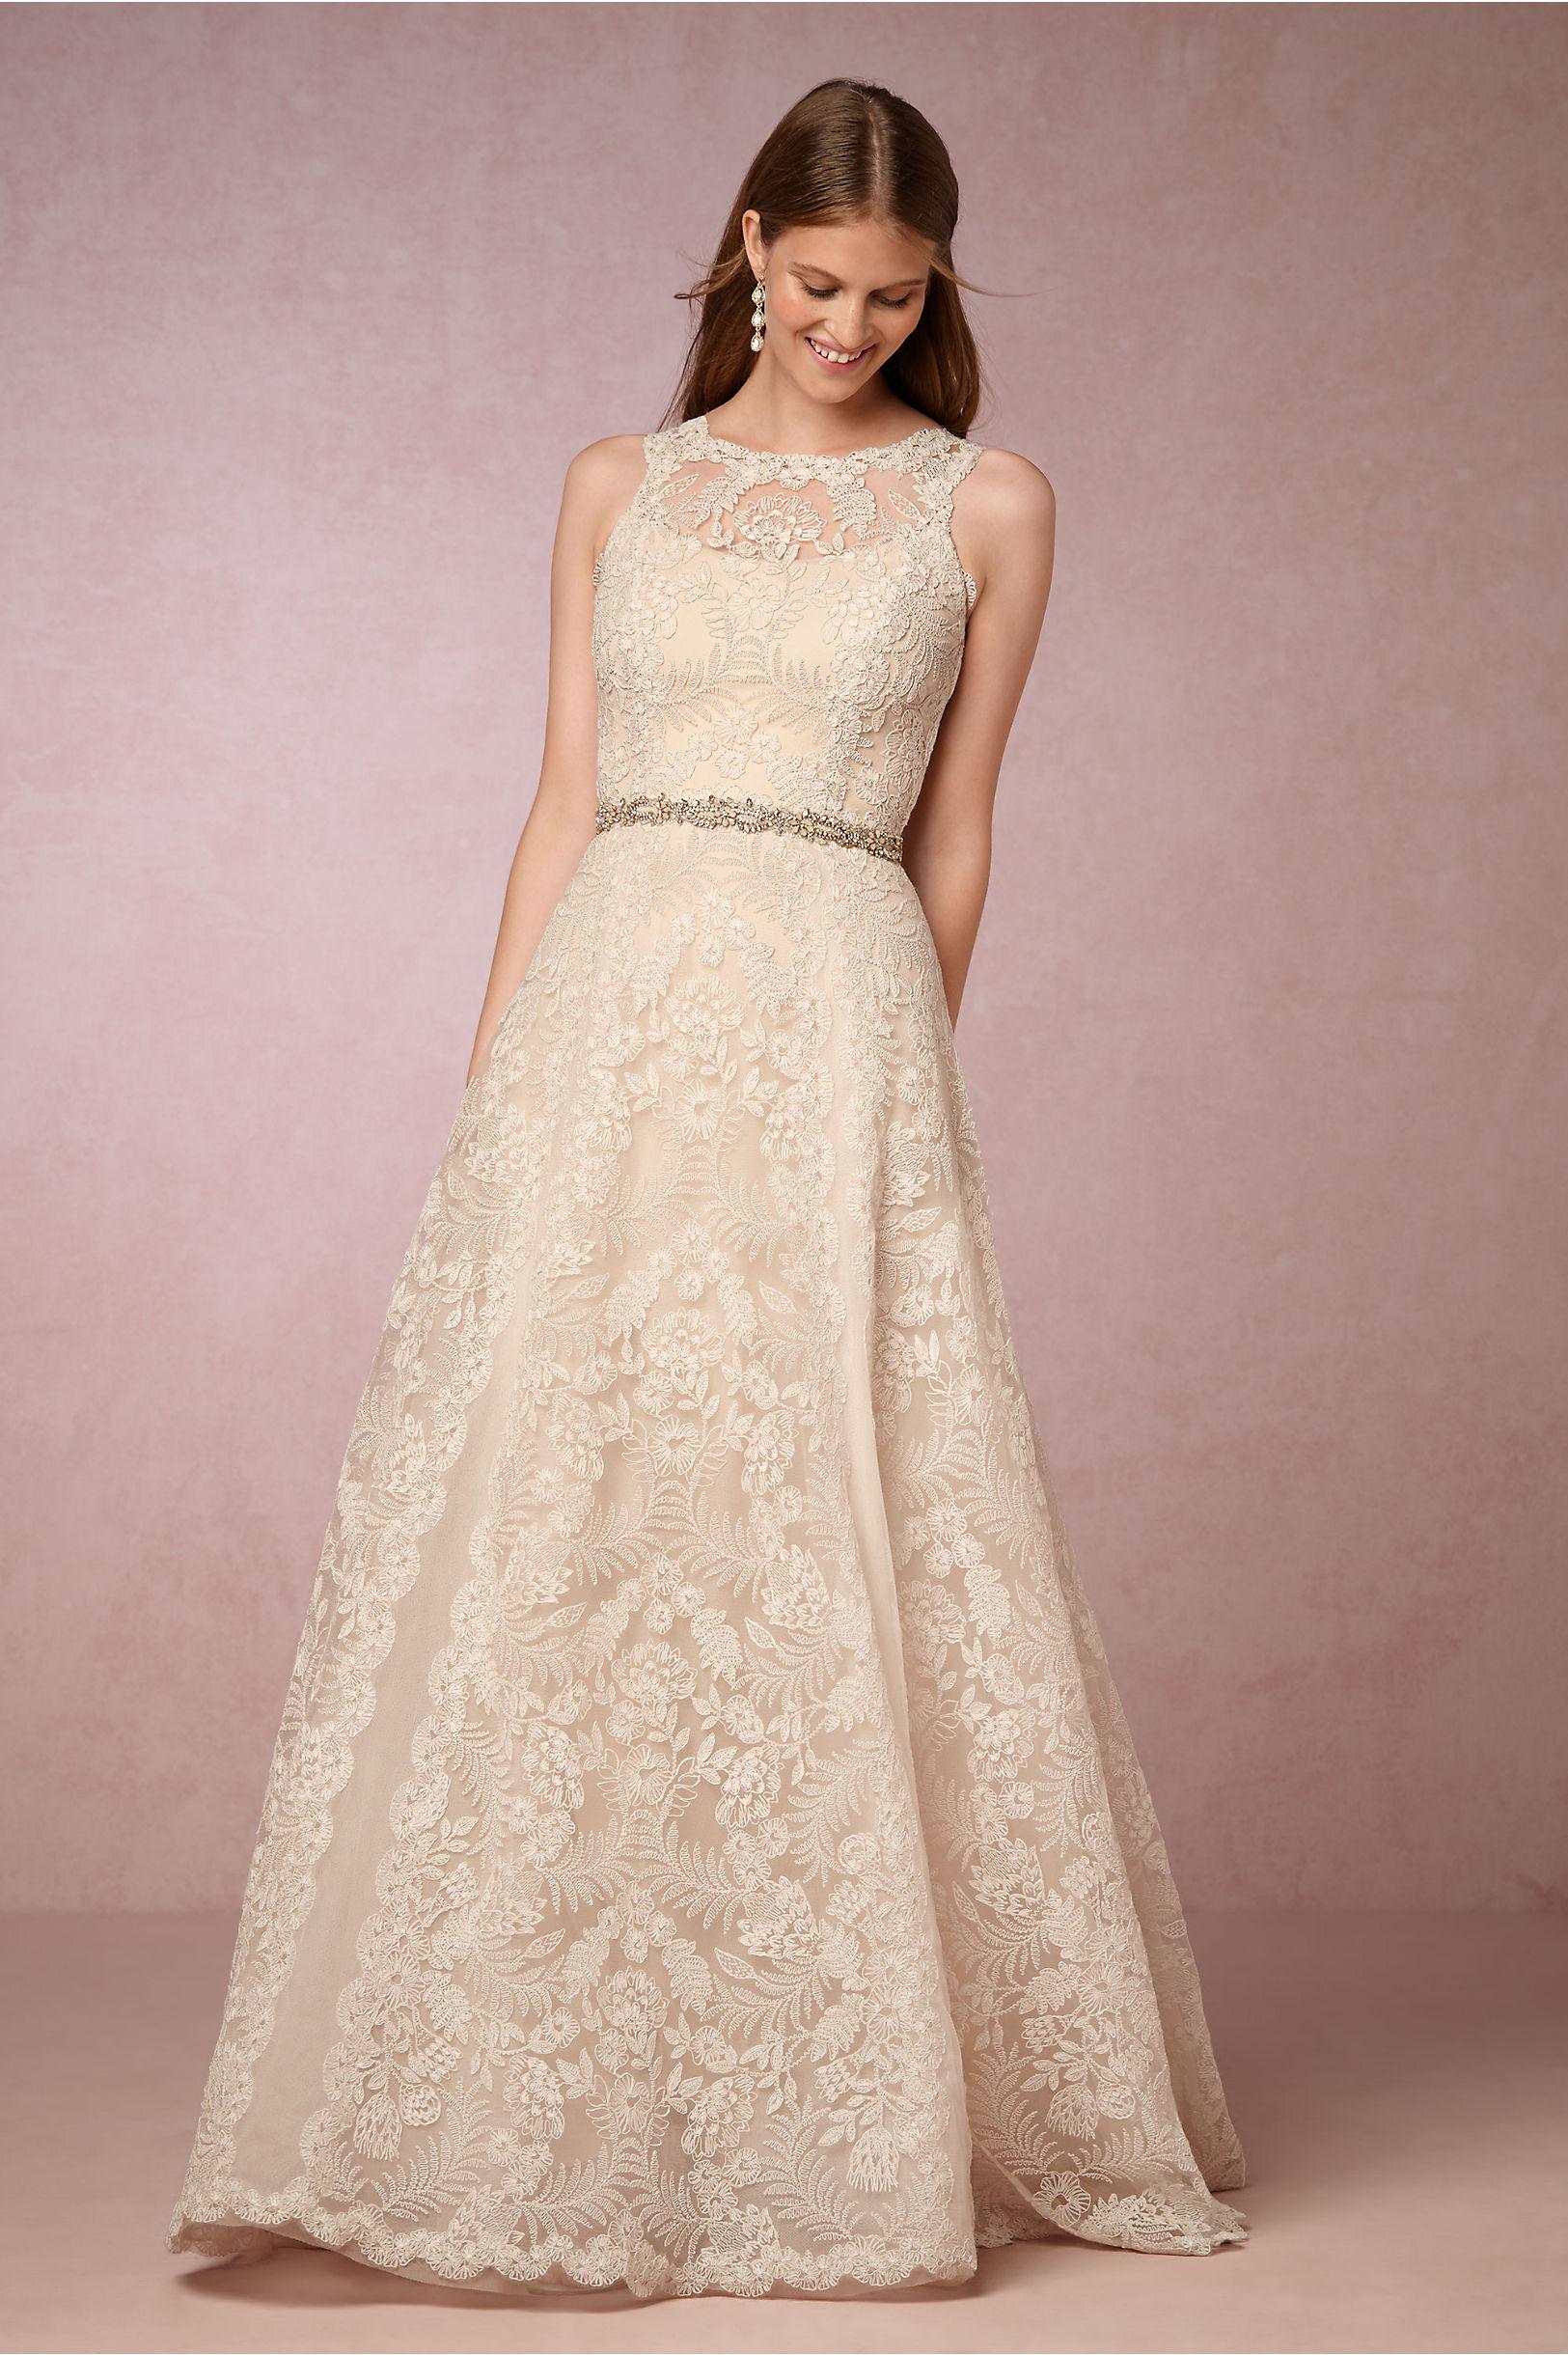 Lyra gown in sale wedding dresses bhldn for Bhldn wedding dress sale